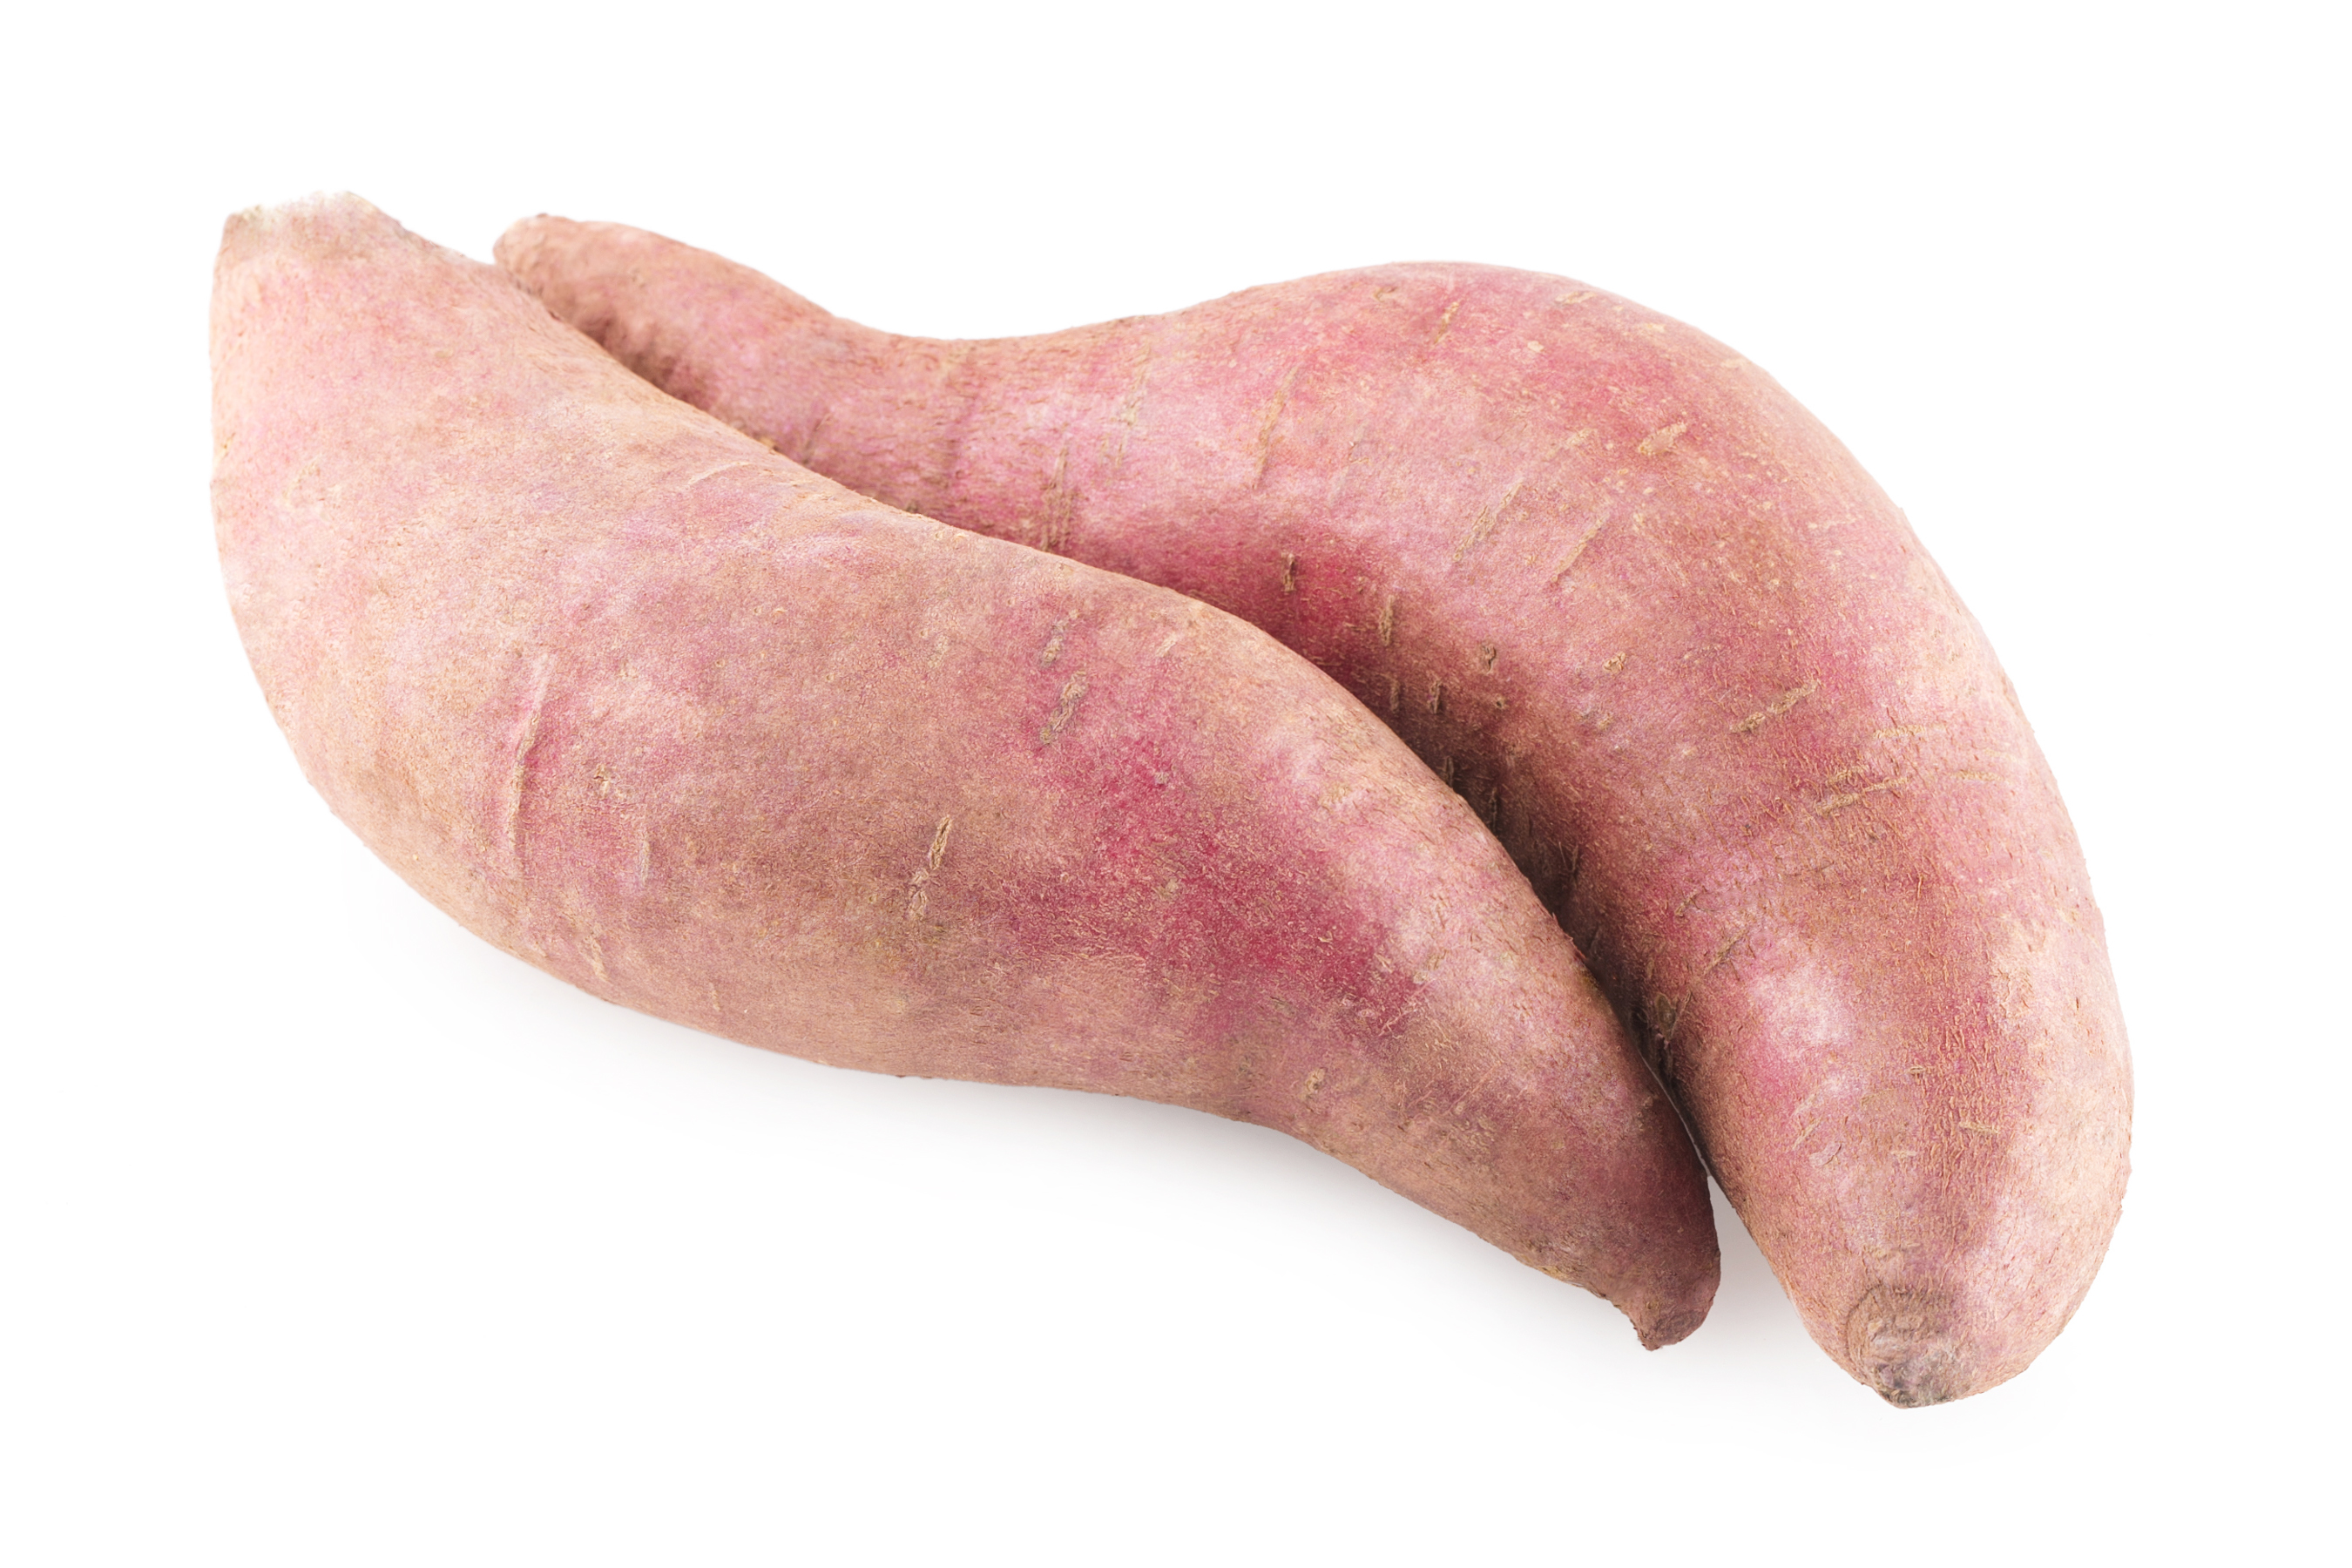 Sweet potatoes, Agriculture, Pile, Plant, Potato, HQ Photo